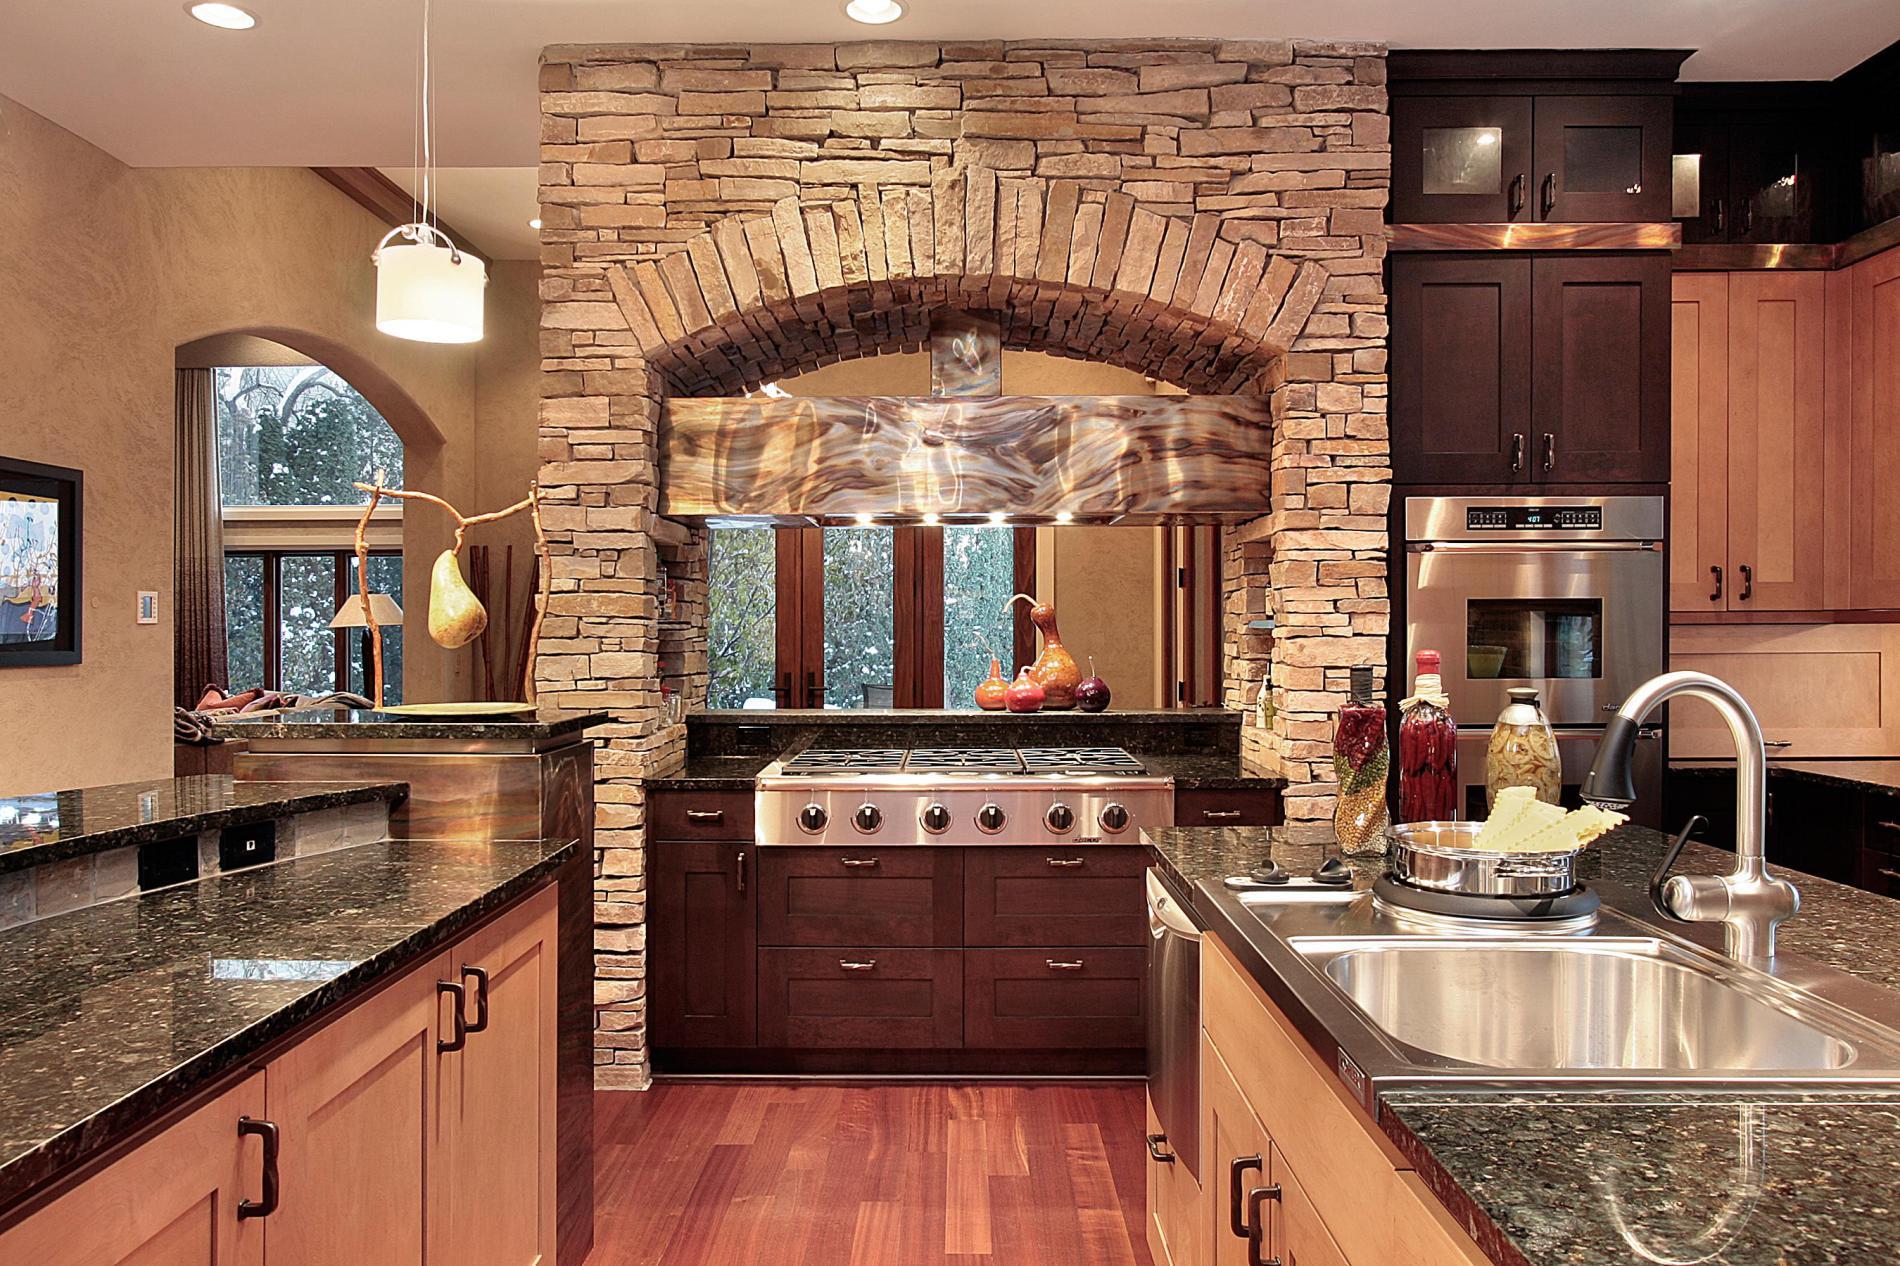 кухня в стиле шале.jpg